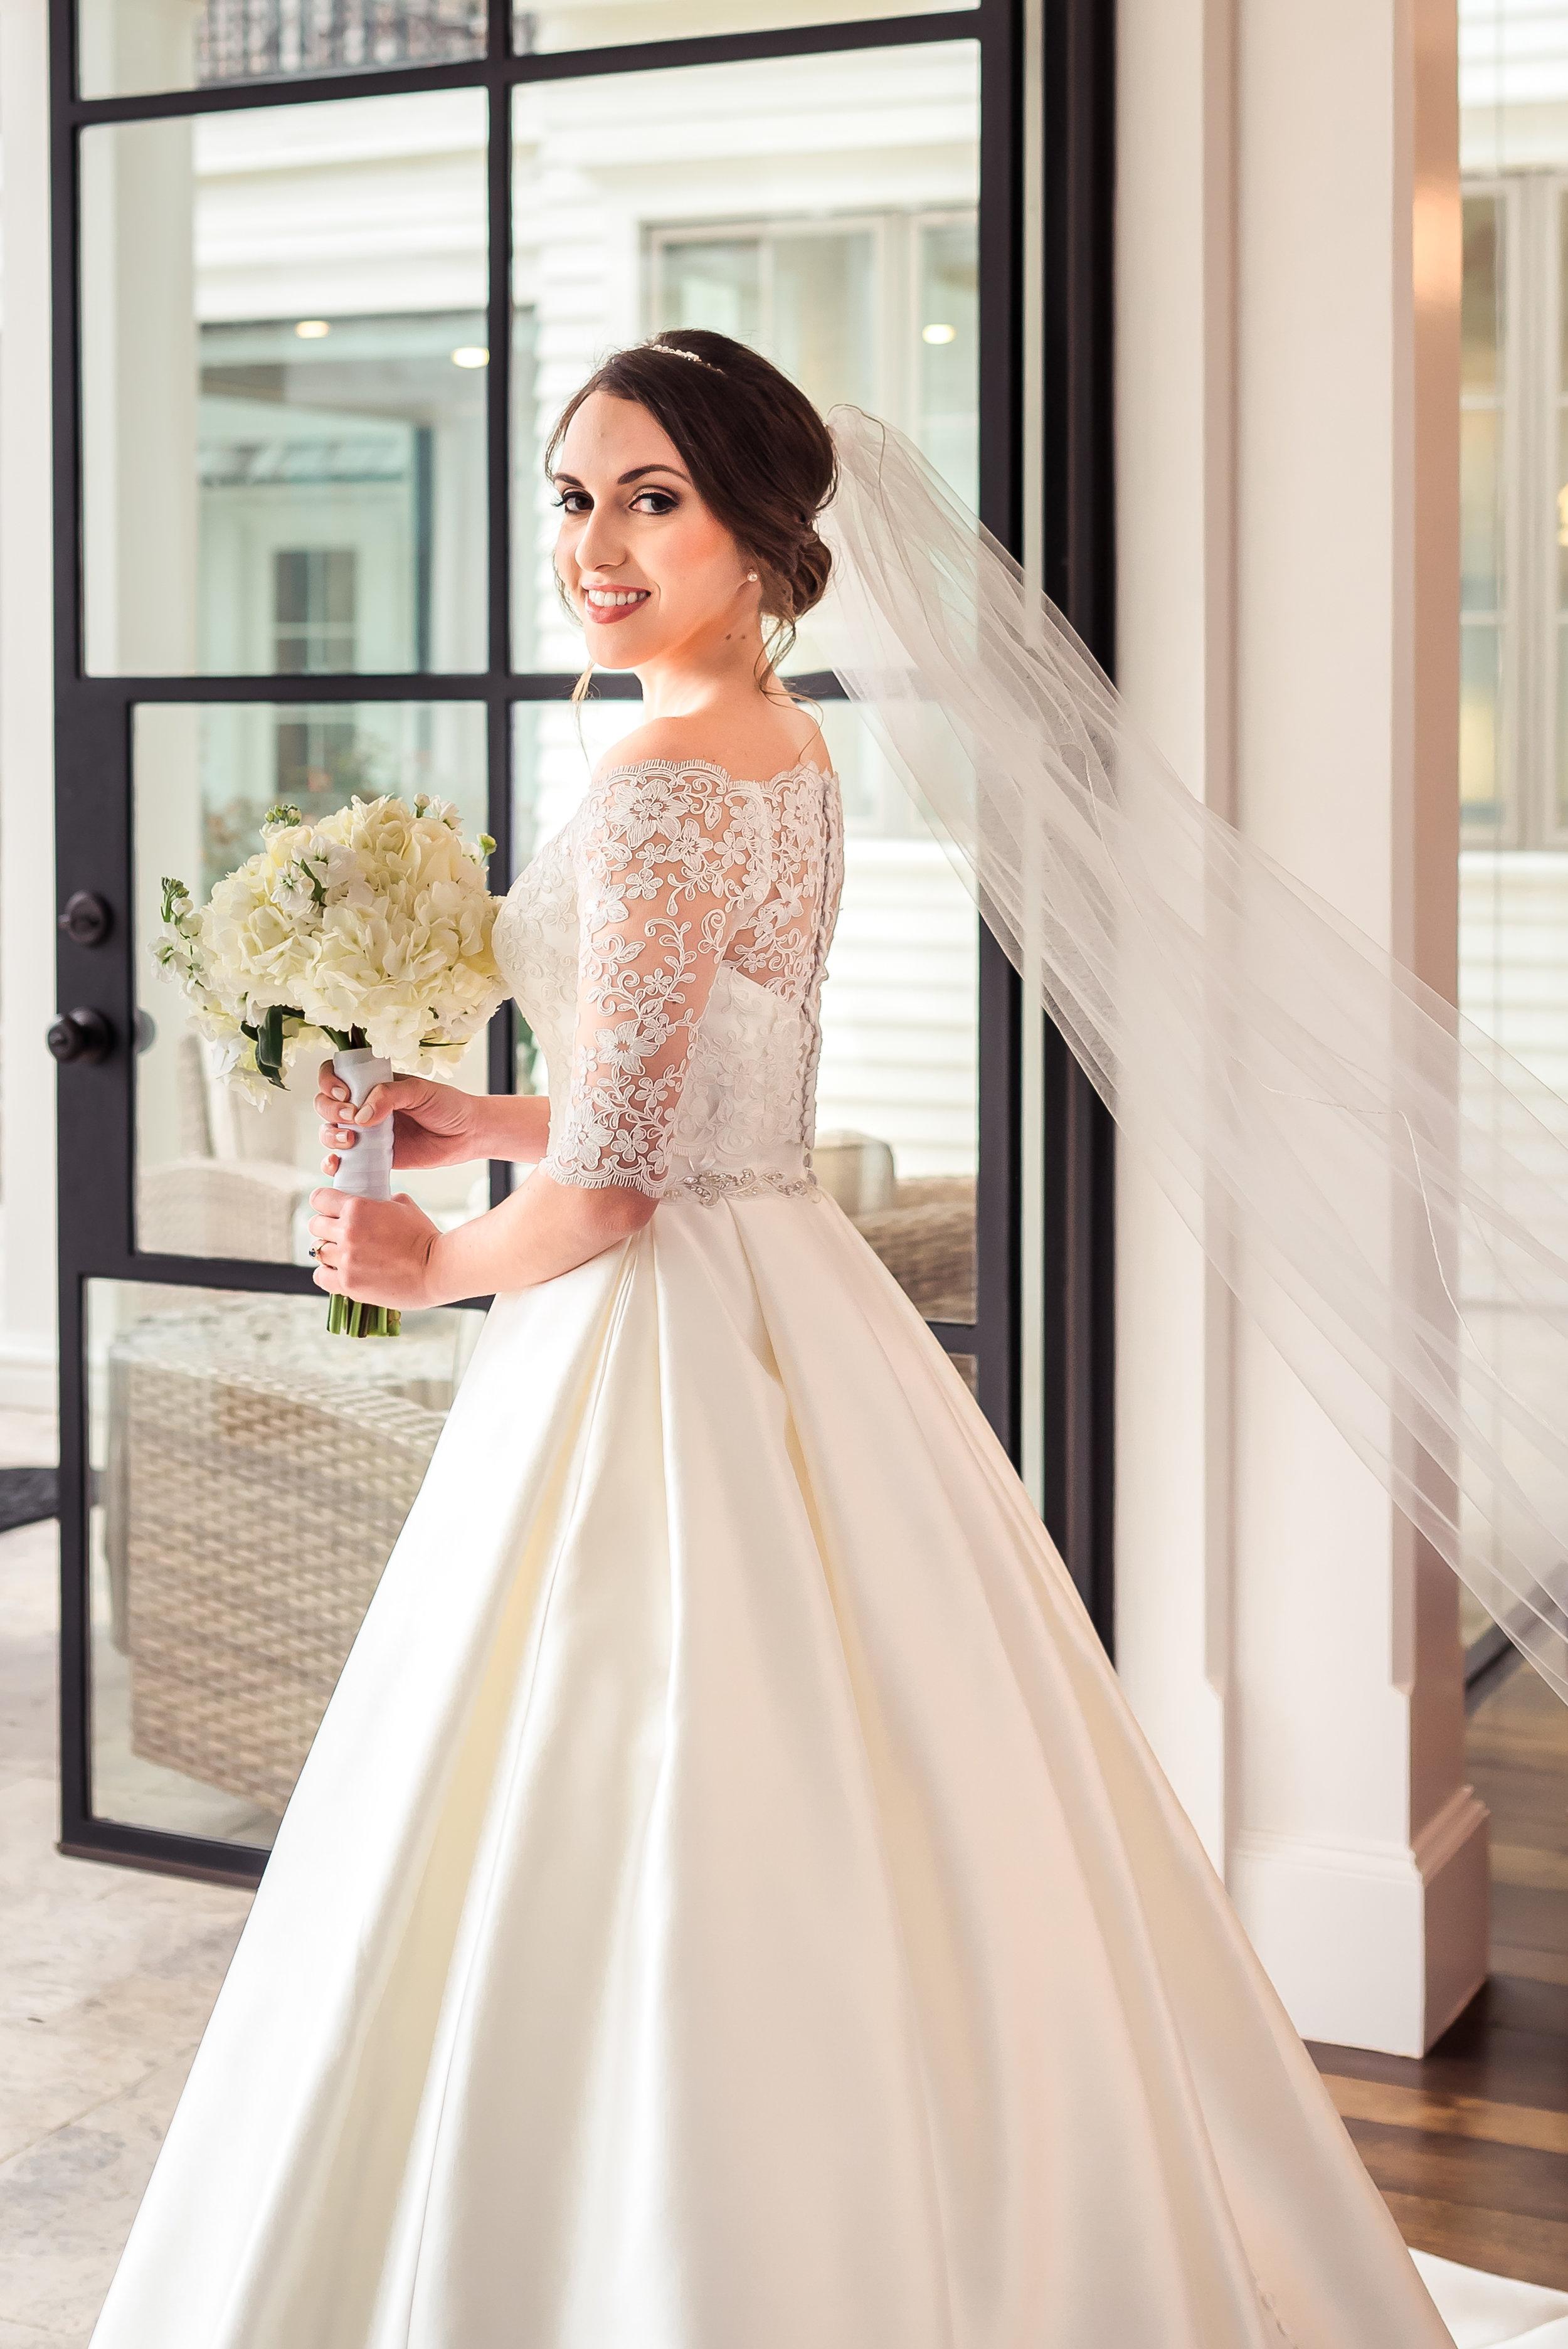 katy-wedding-photographer-houston-wedding-photographer-bride-sugar-land-cypress-richmond-spring-bridal-portraits.jpg